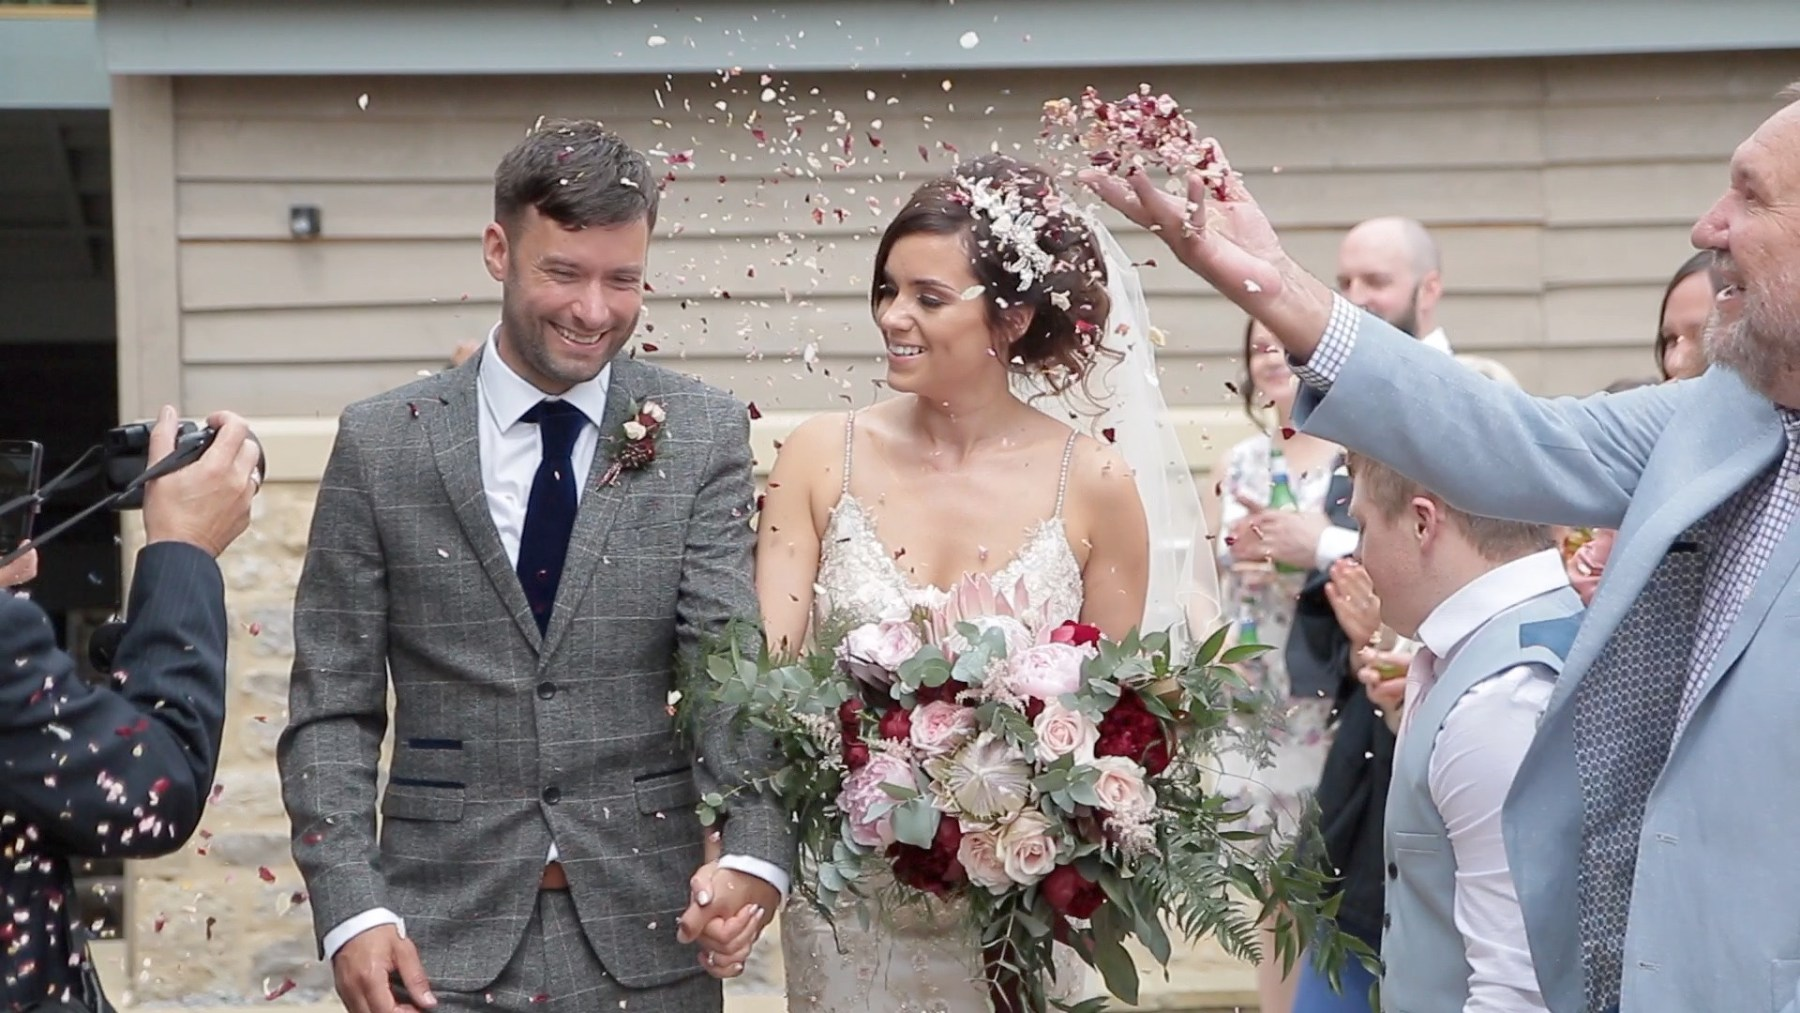 Gamekeeper's Inn Wedding Video - Confetti